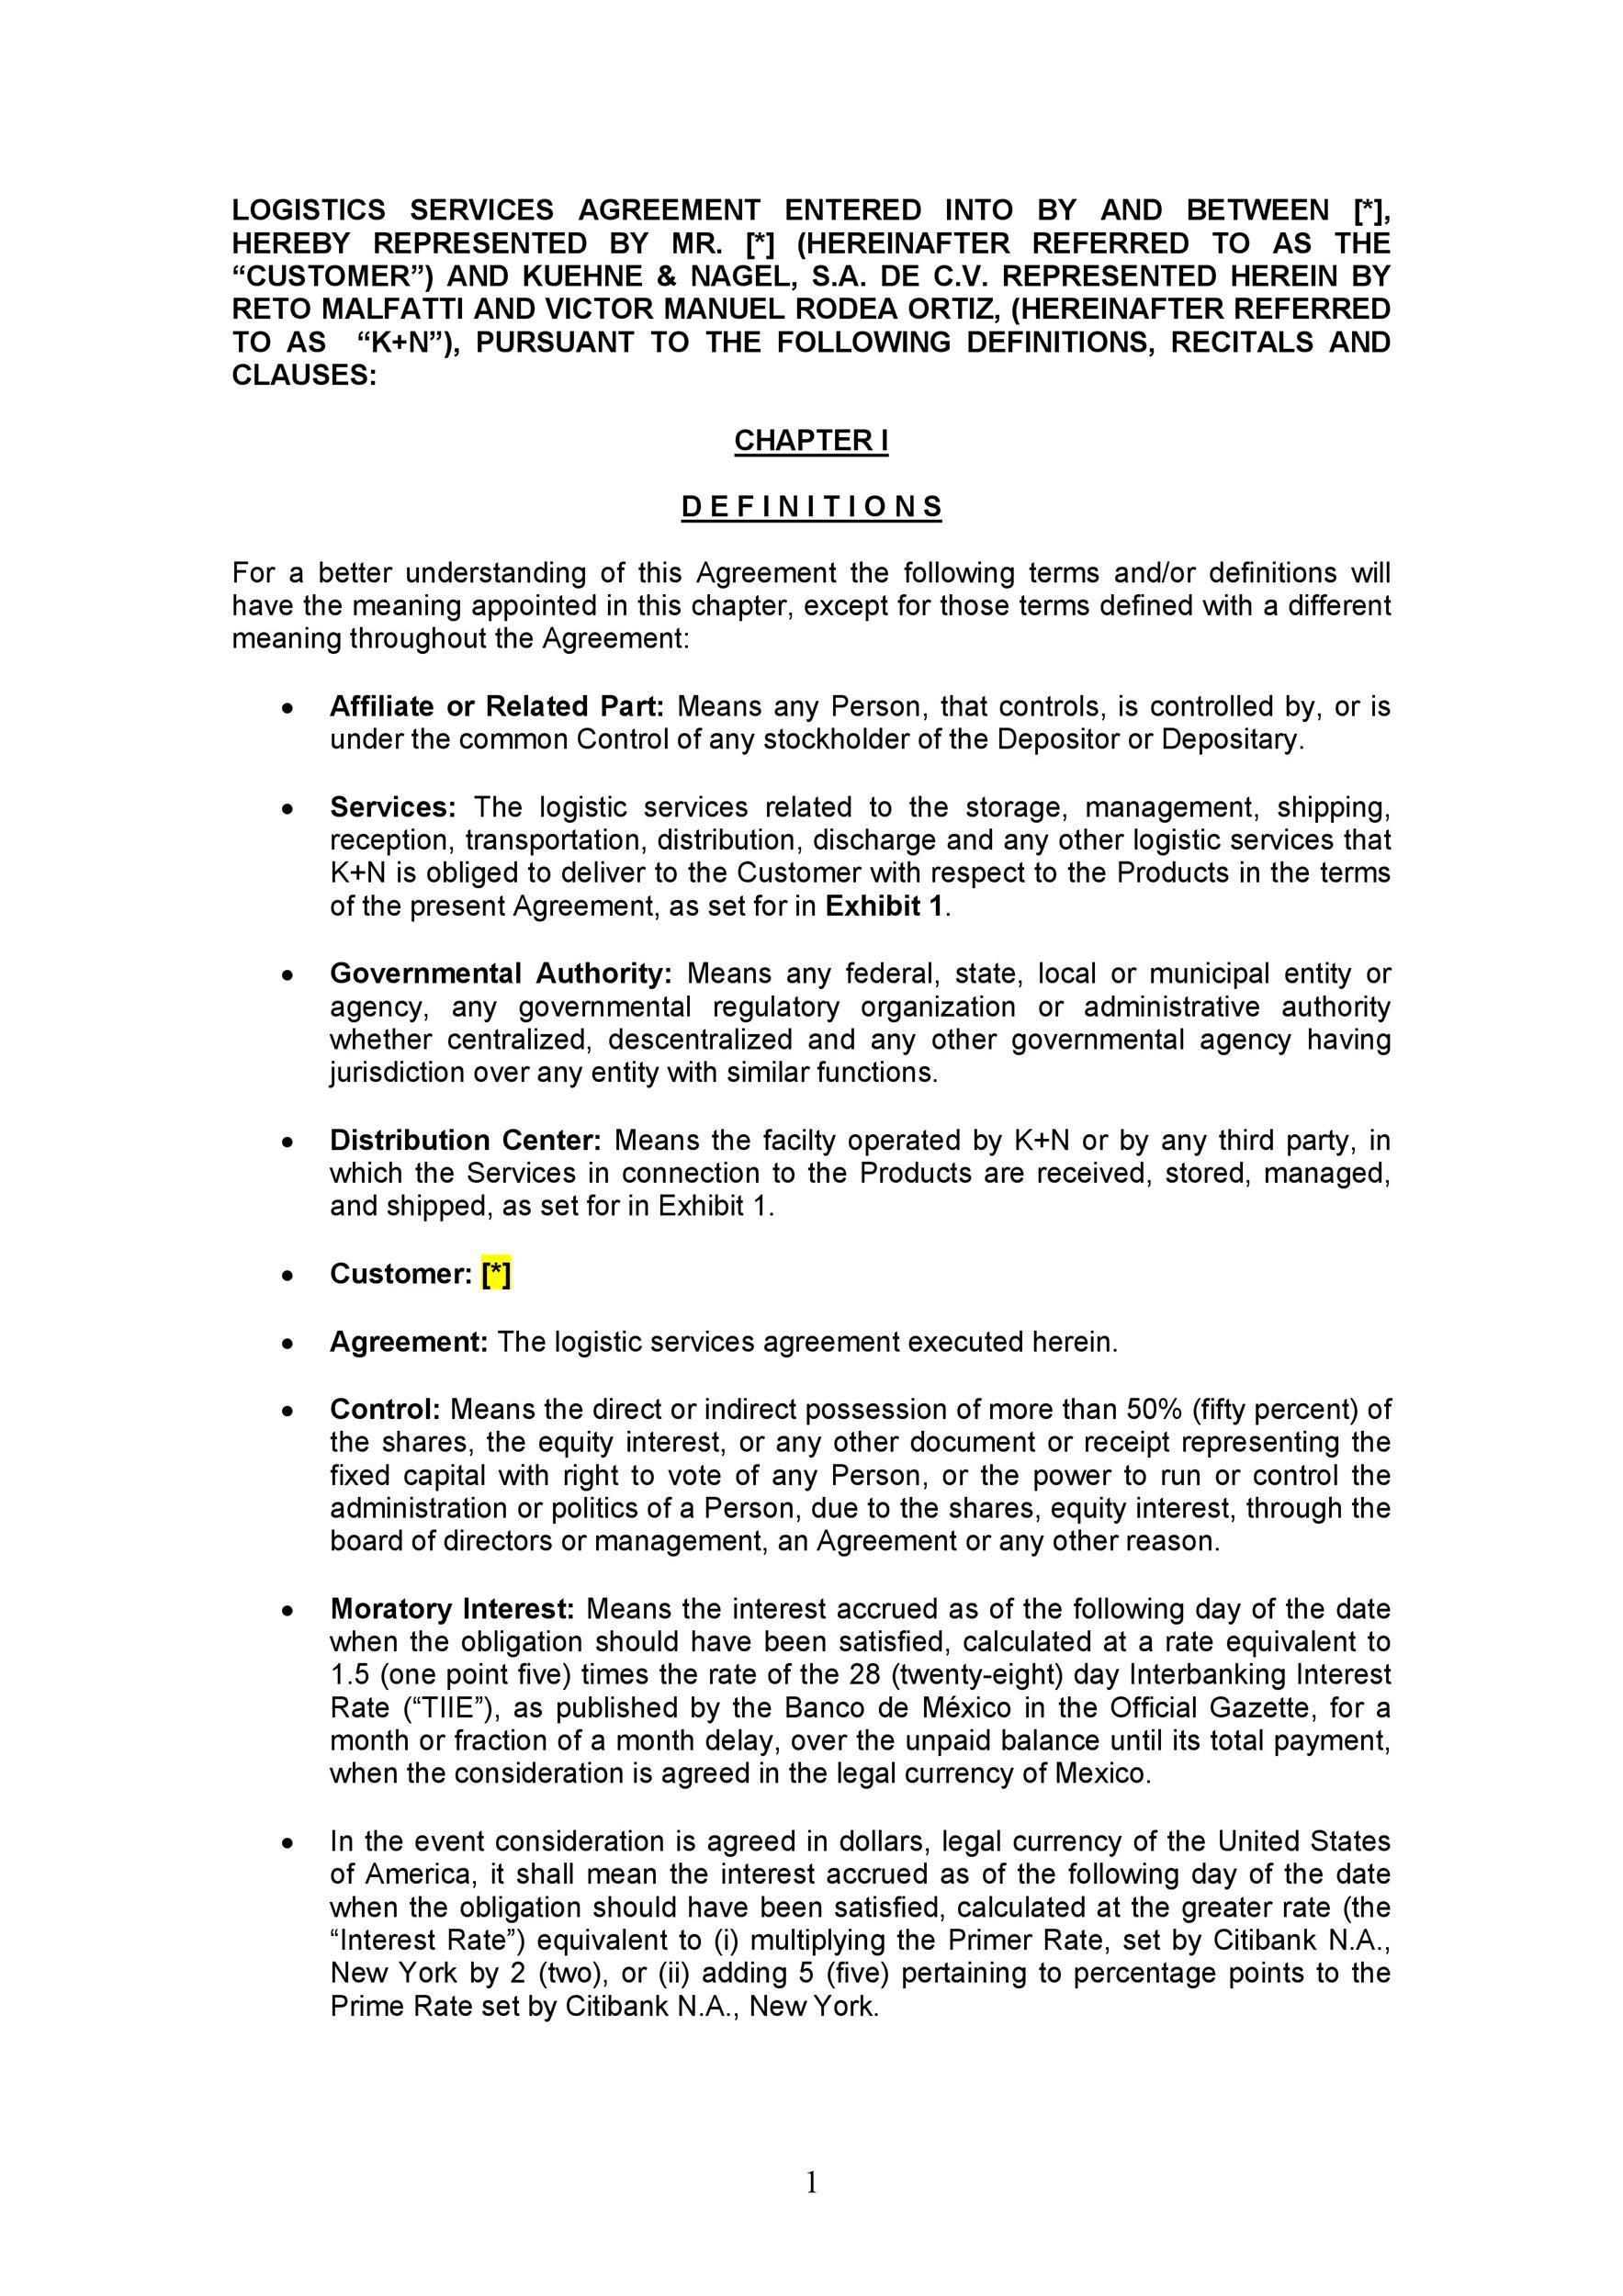 share allocation agreement - Onwebioinnovate - partnership agreements